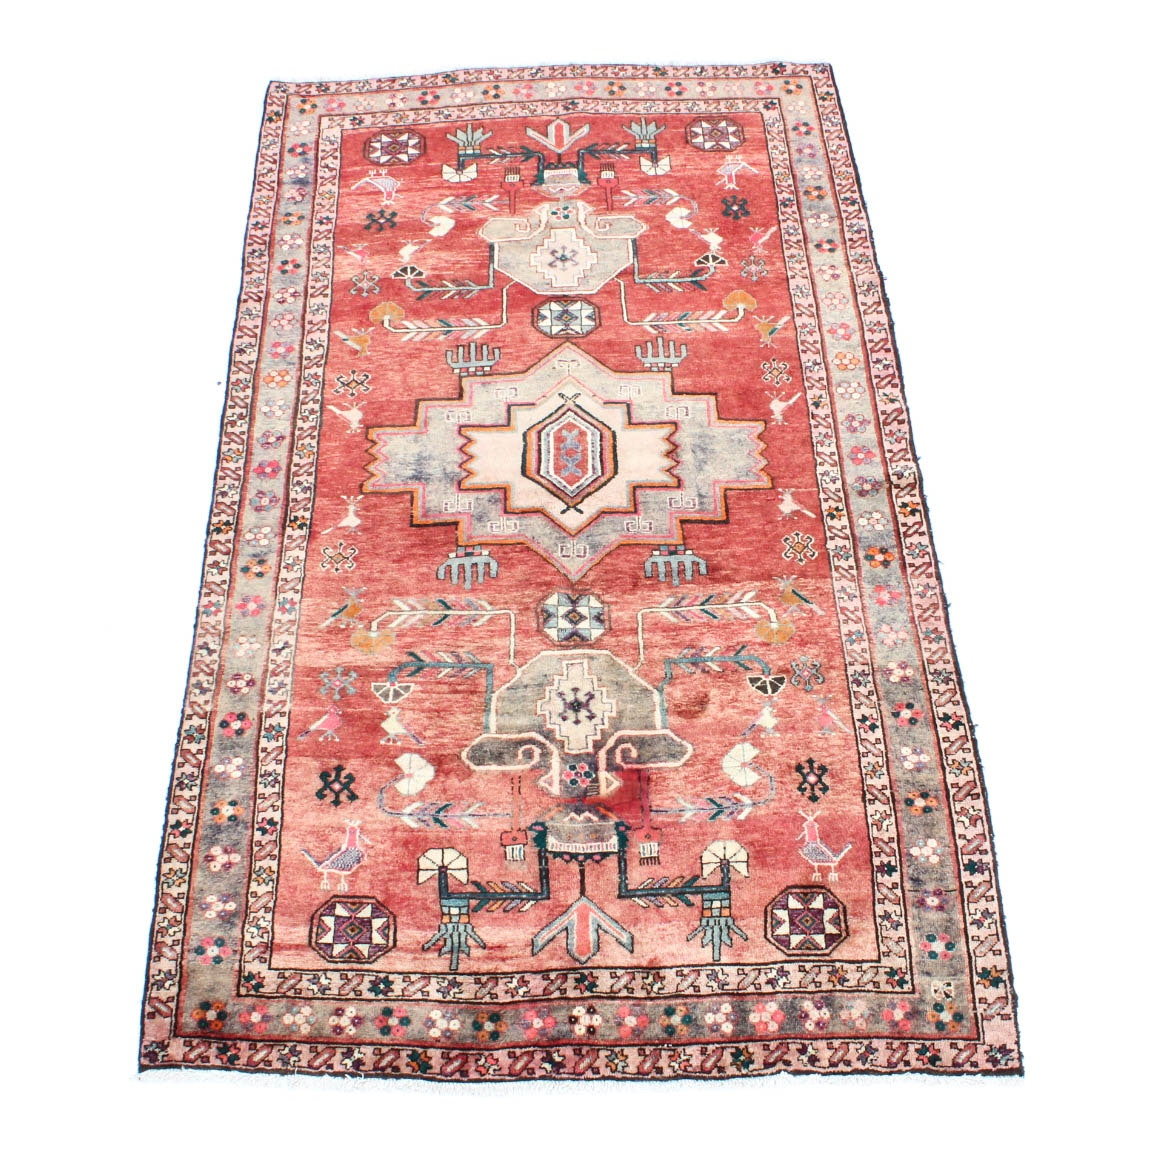 "Handwoven 5'3"" x 9'3"" Persian Mahal Pictorial Area Rug"